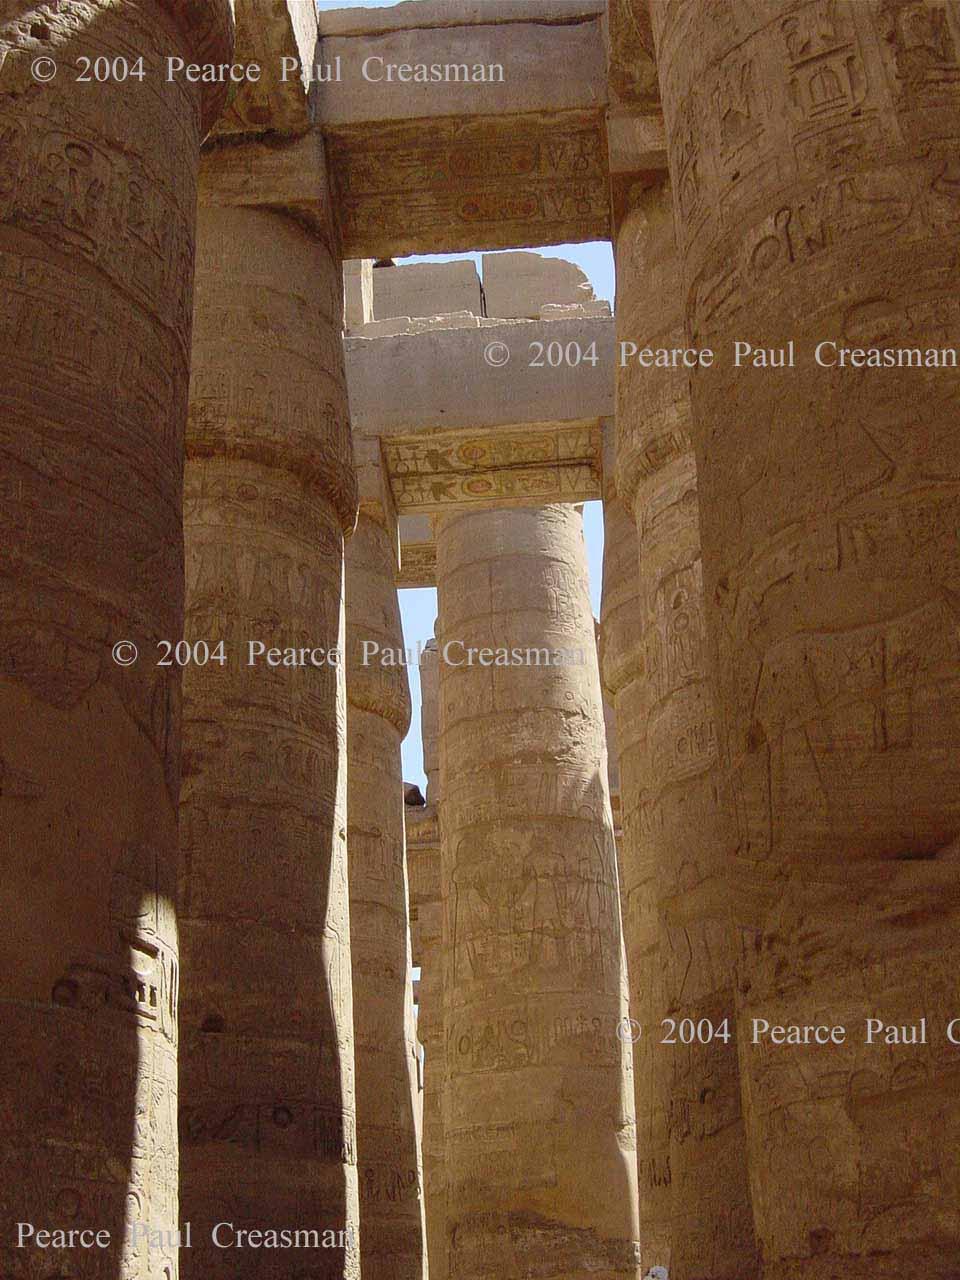 Hall of Giant Columns at Karnak